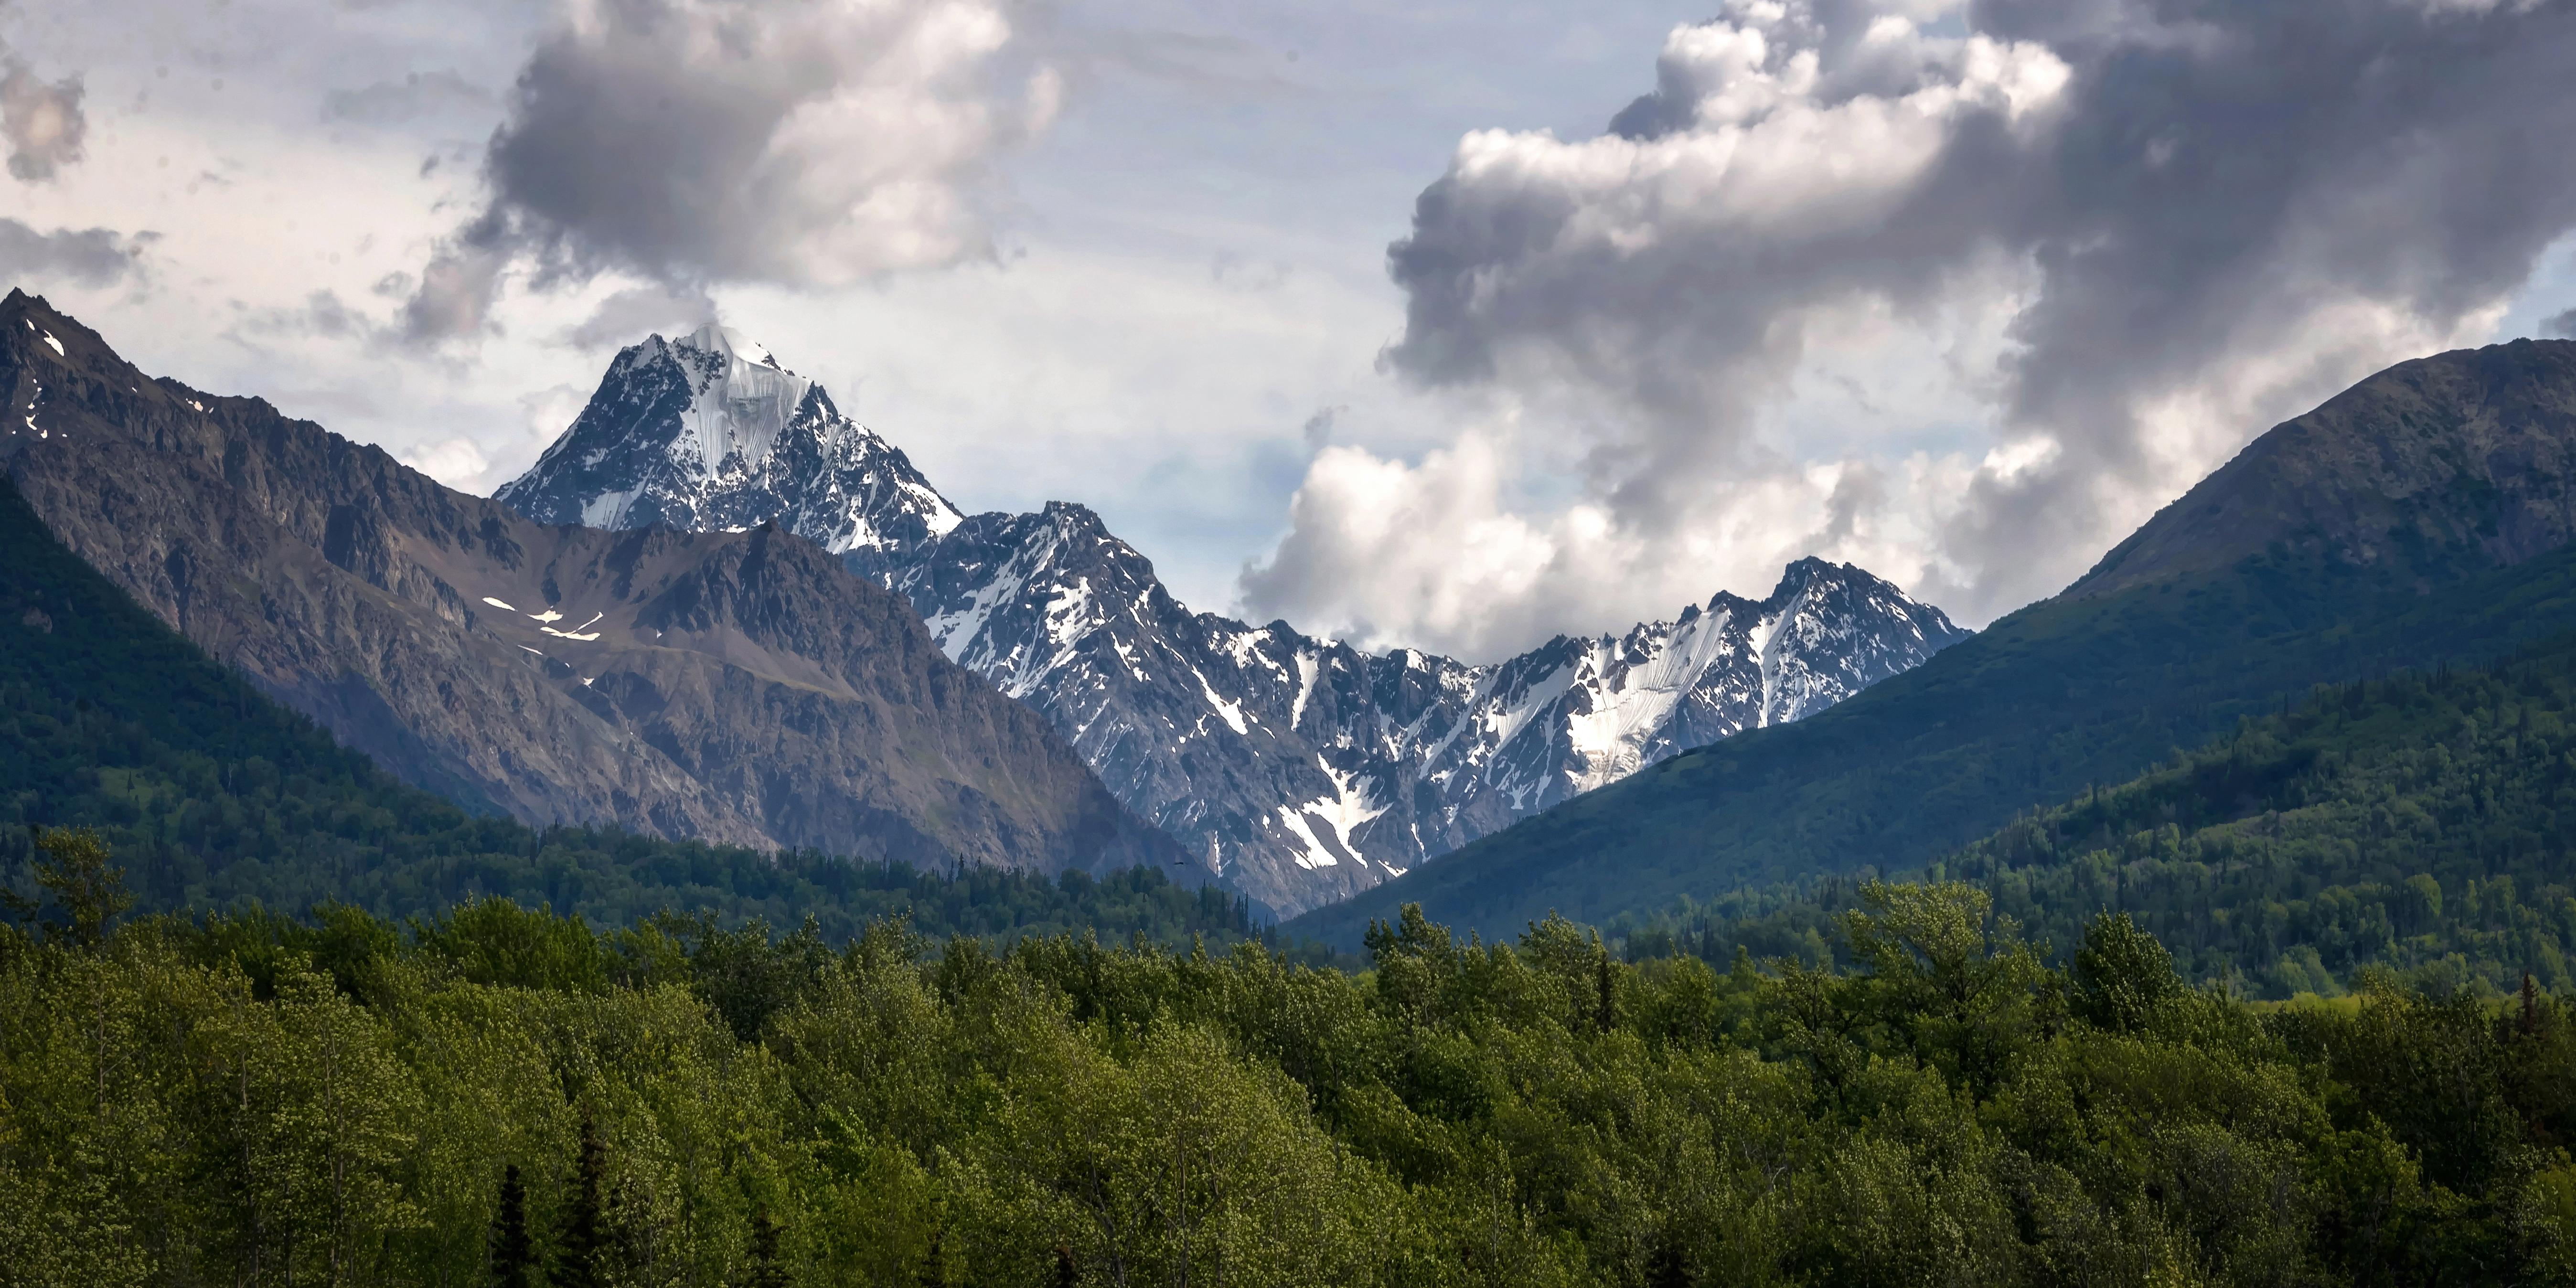 terre nature paysage alaska nature - photo #13